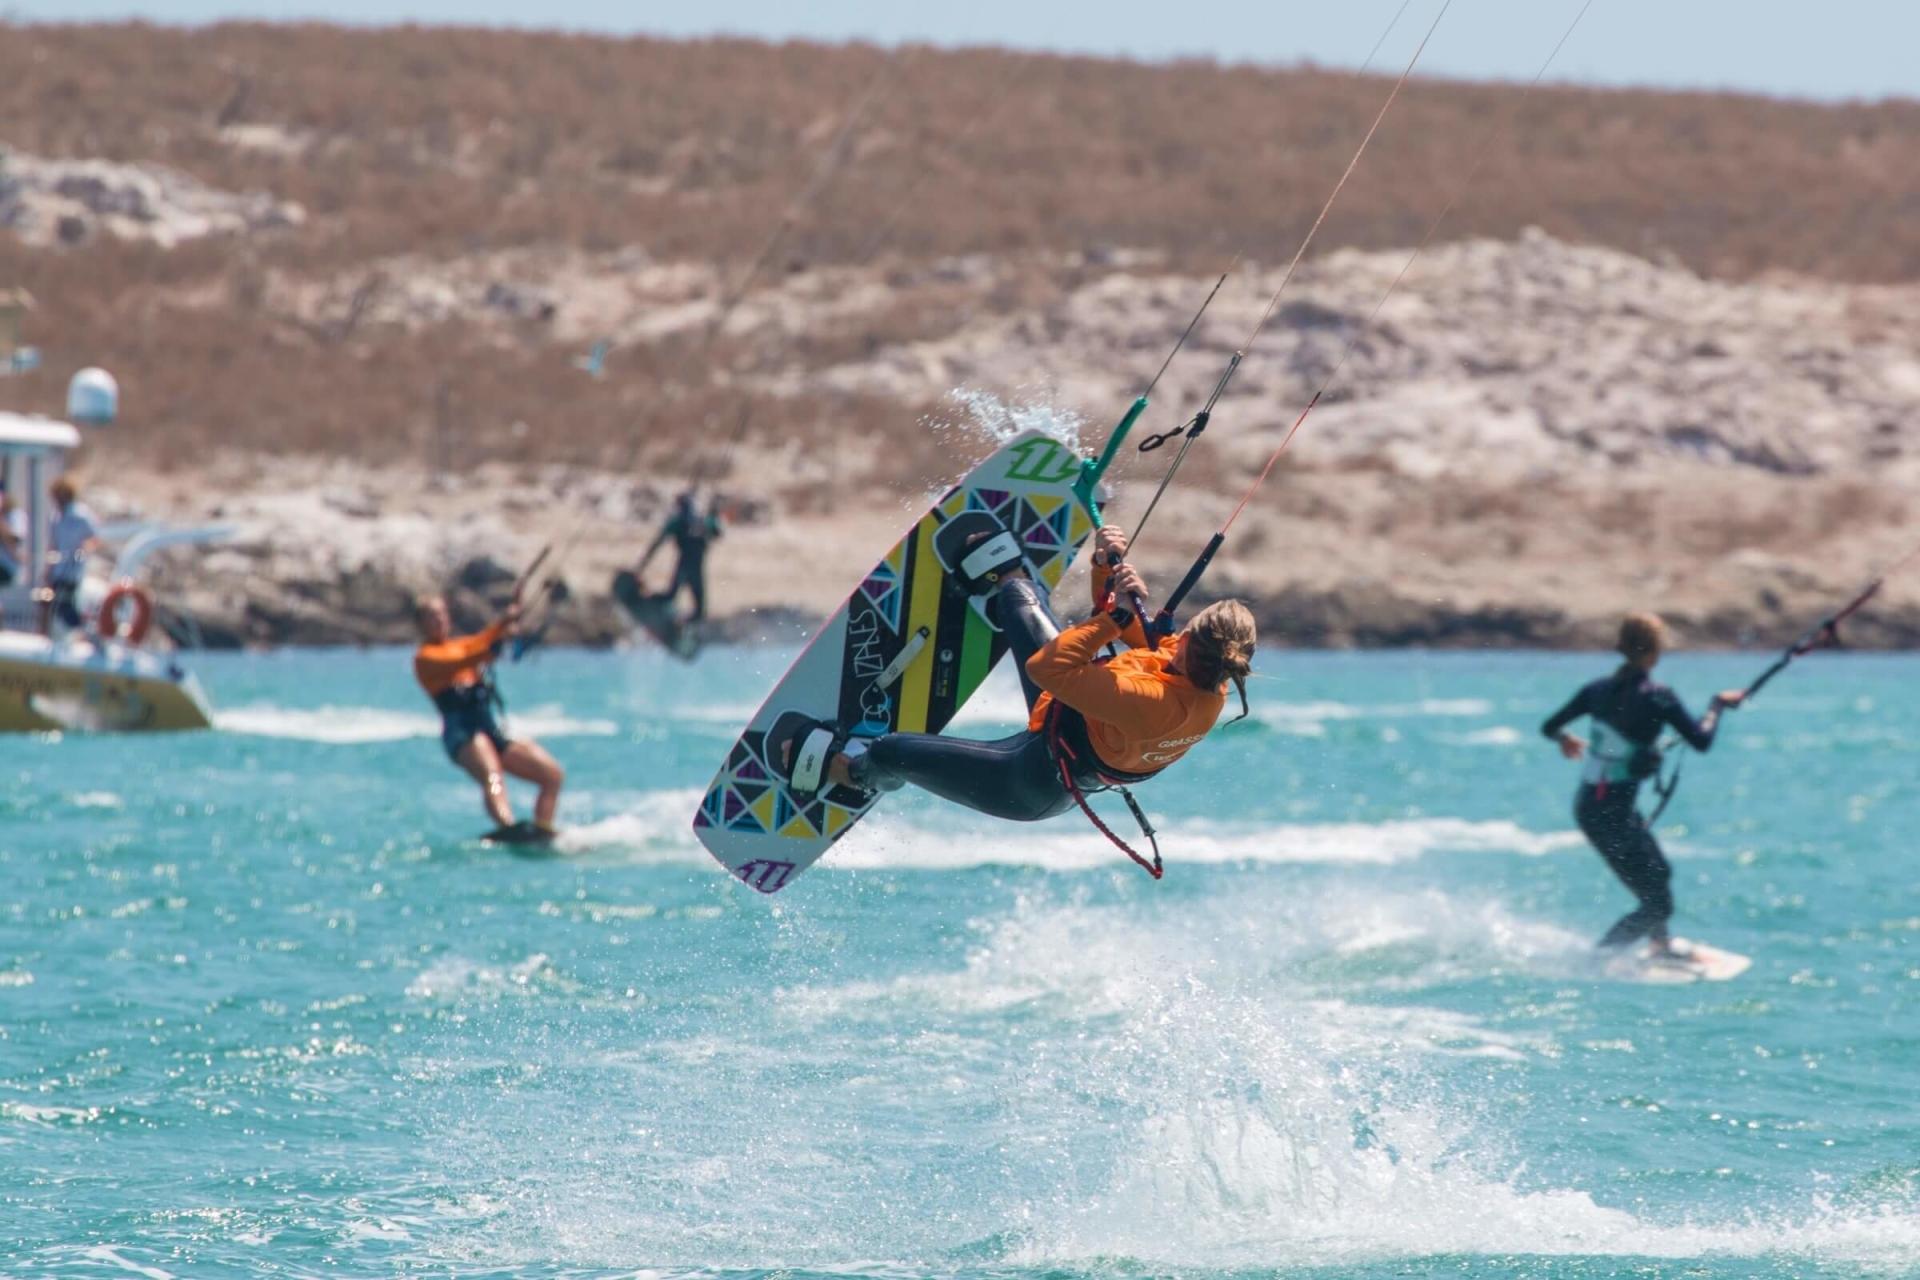 surfen-en-kite-surfen-in-zuid-afrika-gardenroute